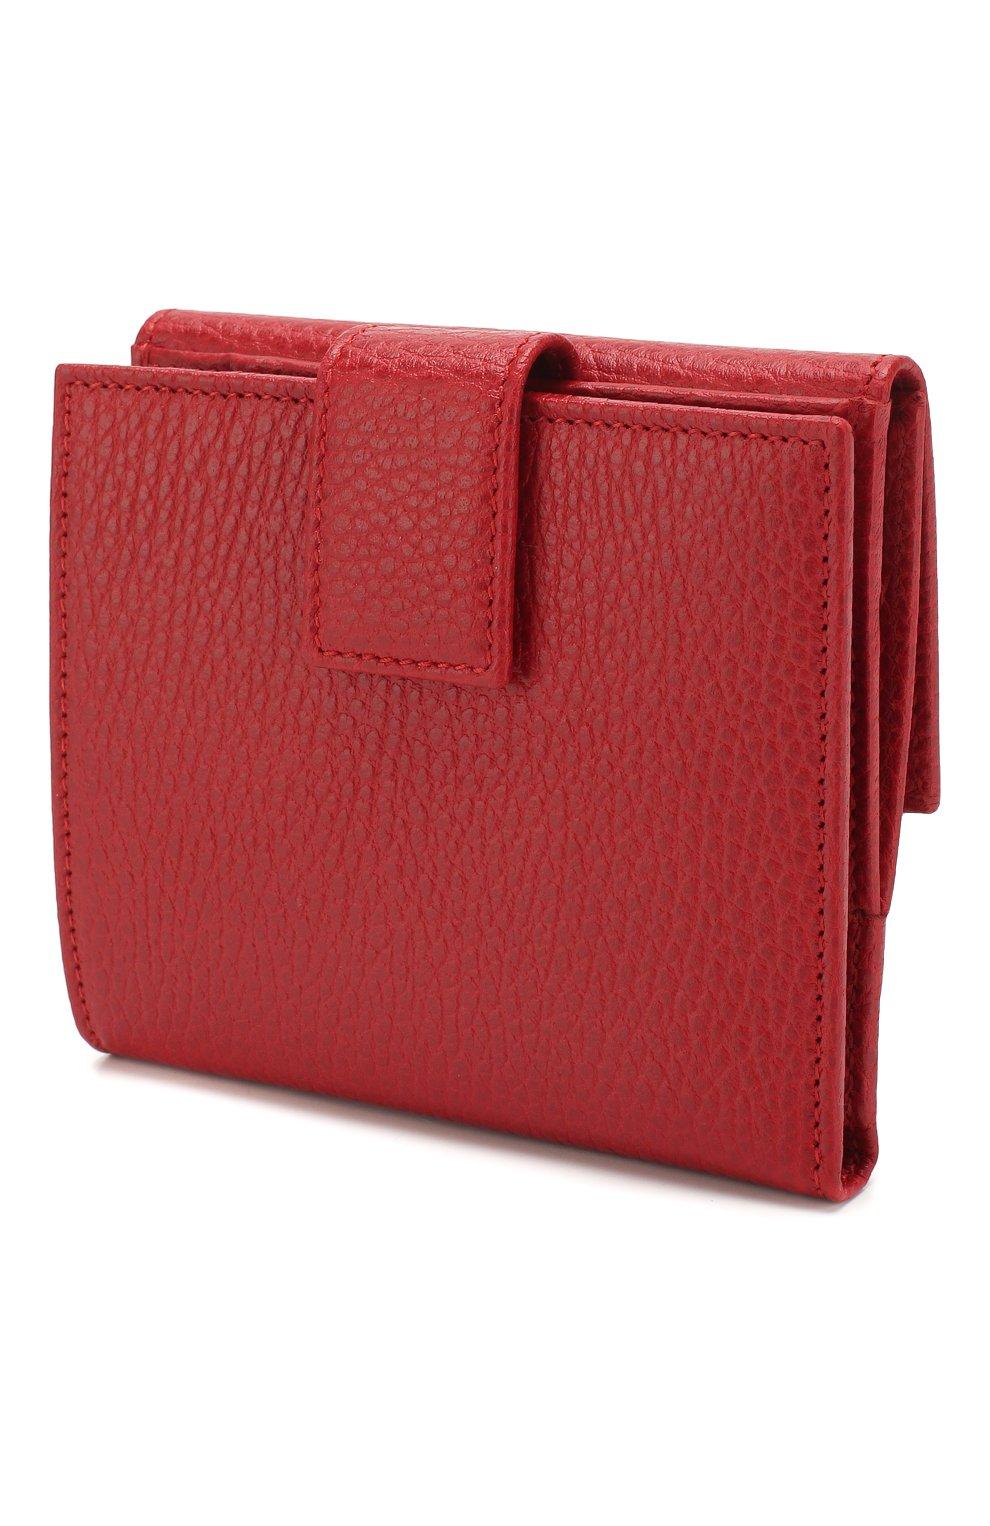 Кожаное портмоне с логотипом бренда Gucci красного цвета | Фото №2